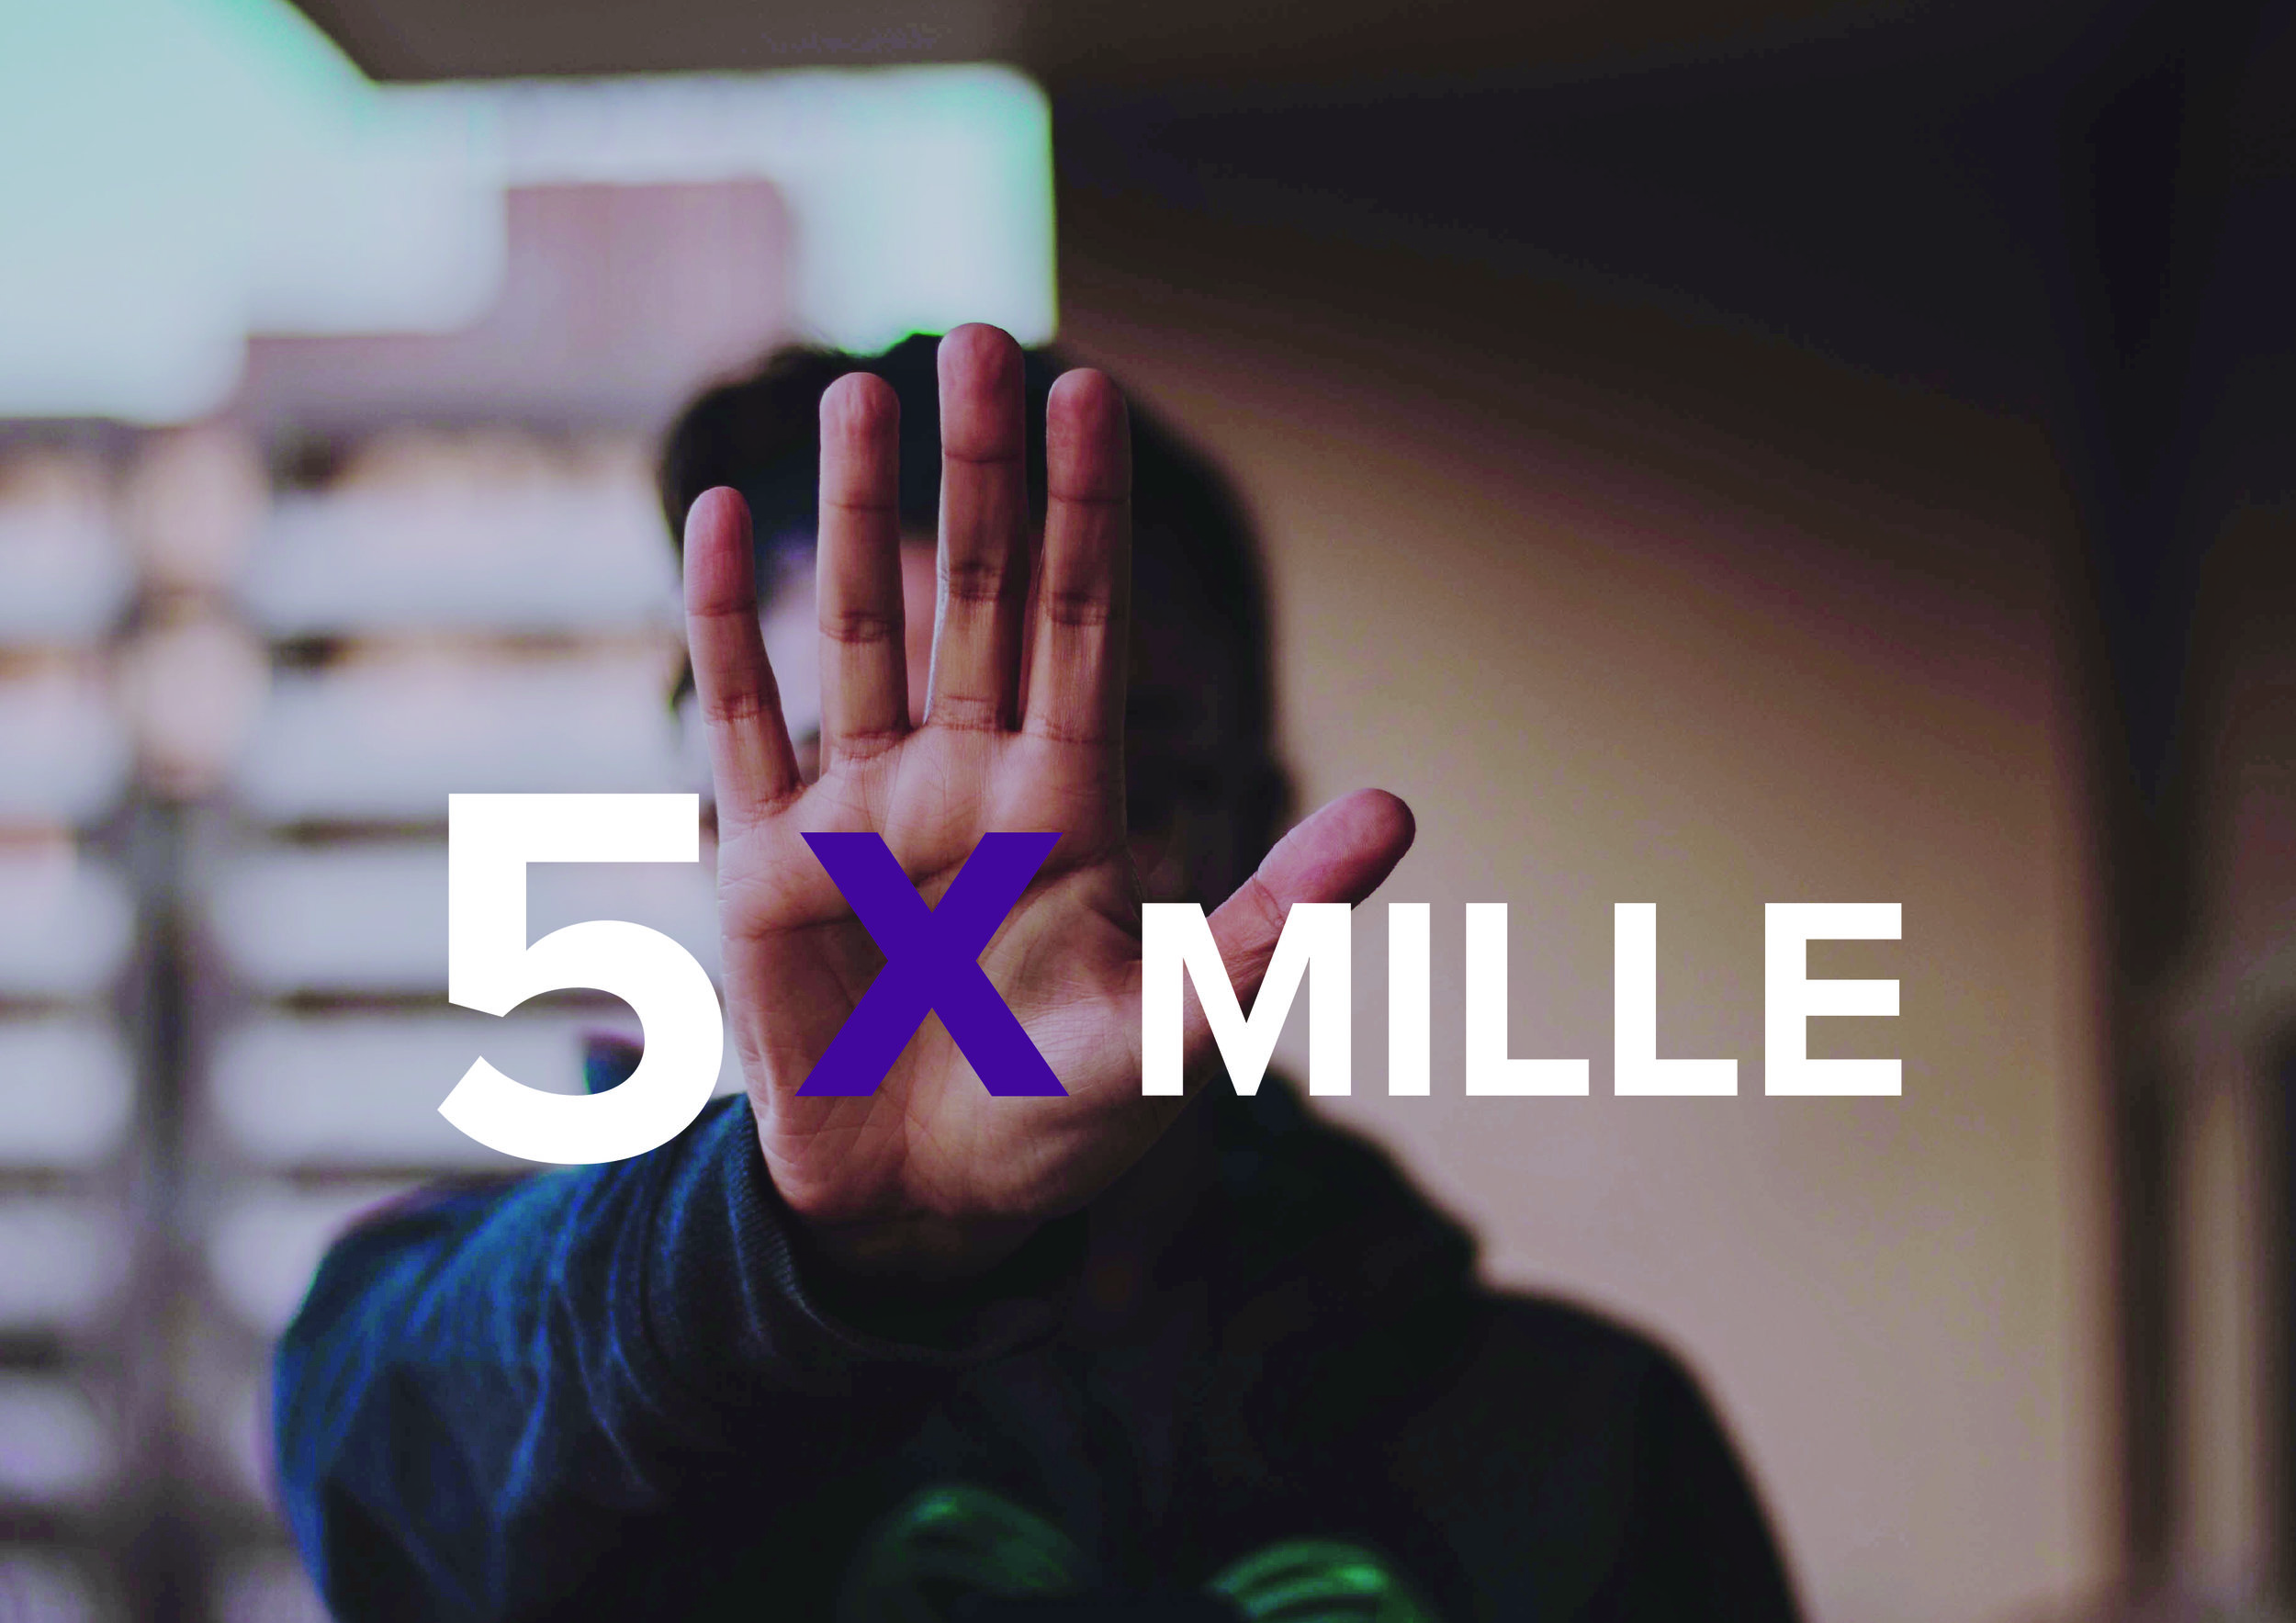 5XMILLE-01.jpg